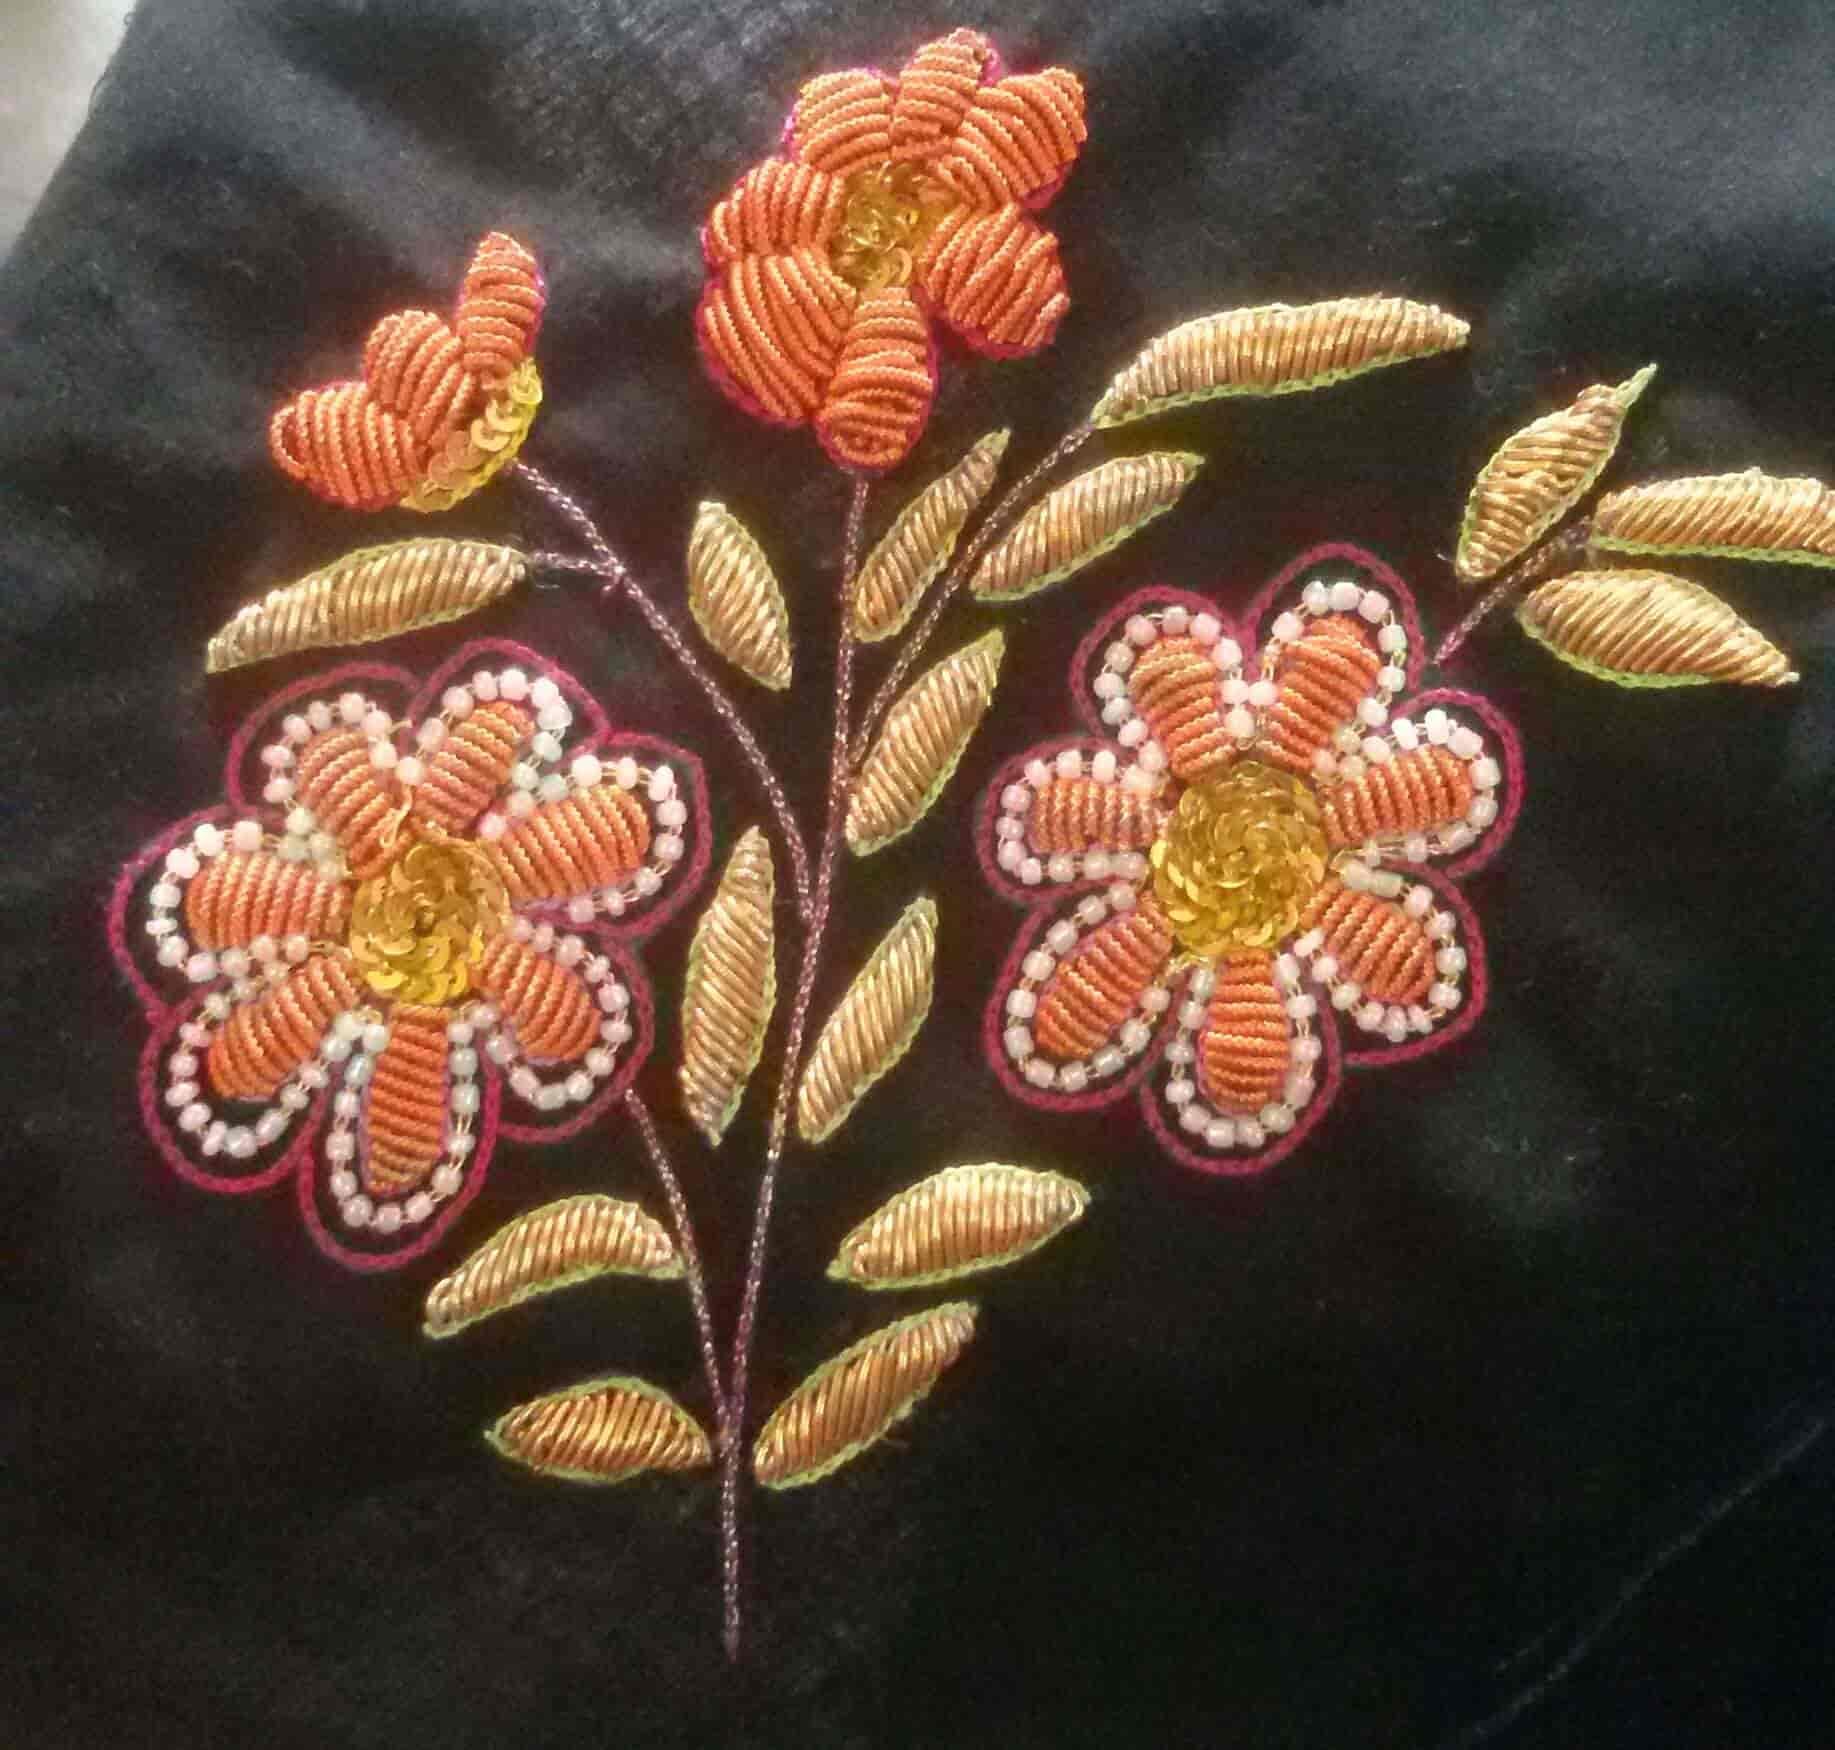 6d18edecf67 ... Embroidery Design - Career Institute For Fashion Designing Photos